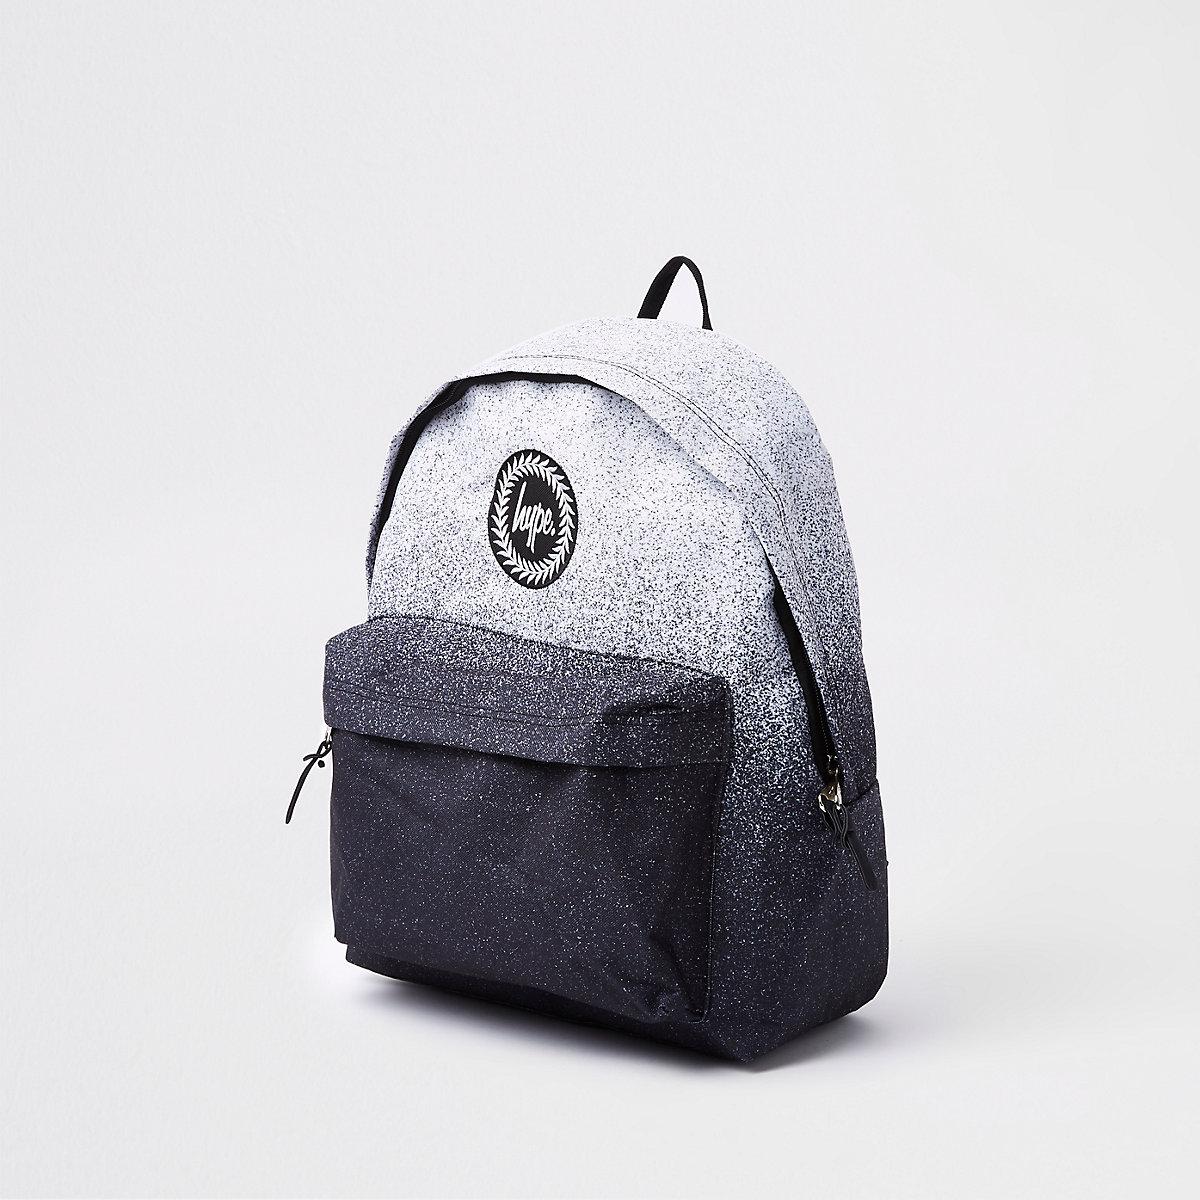 d2b857f172 Hype grey fade backpack - Backpacks   Backpacks - Bags - men